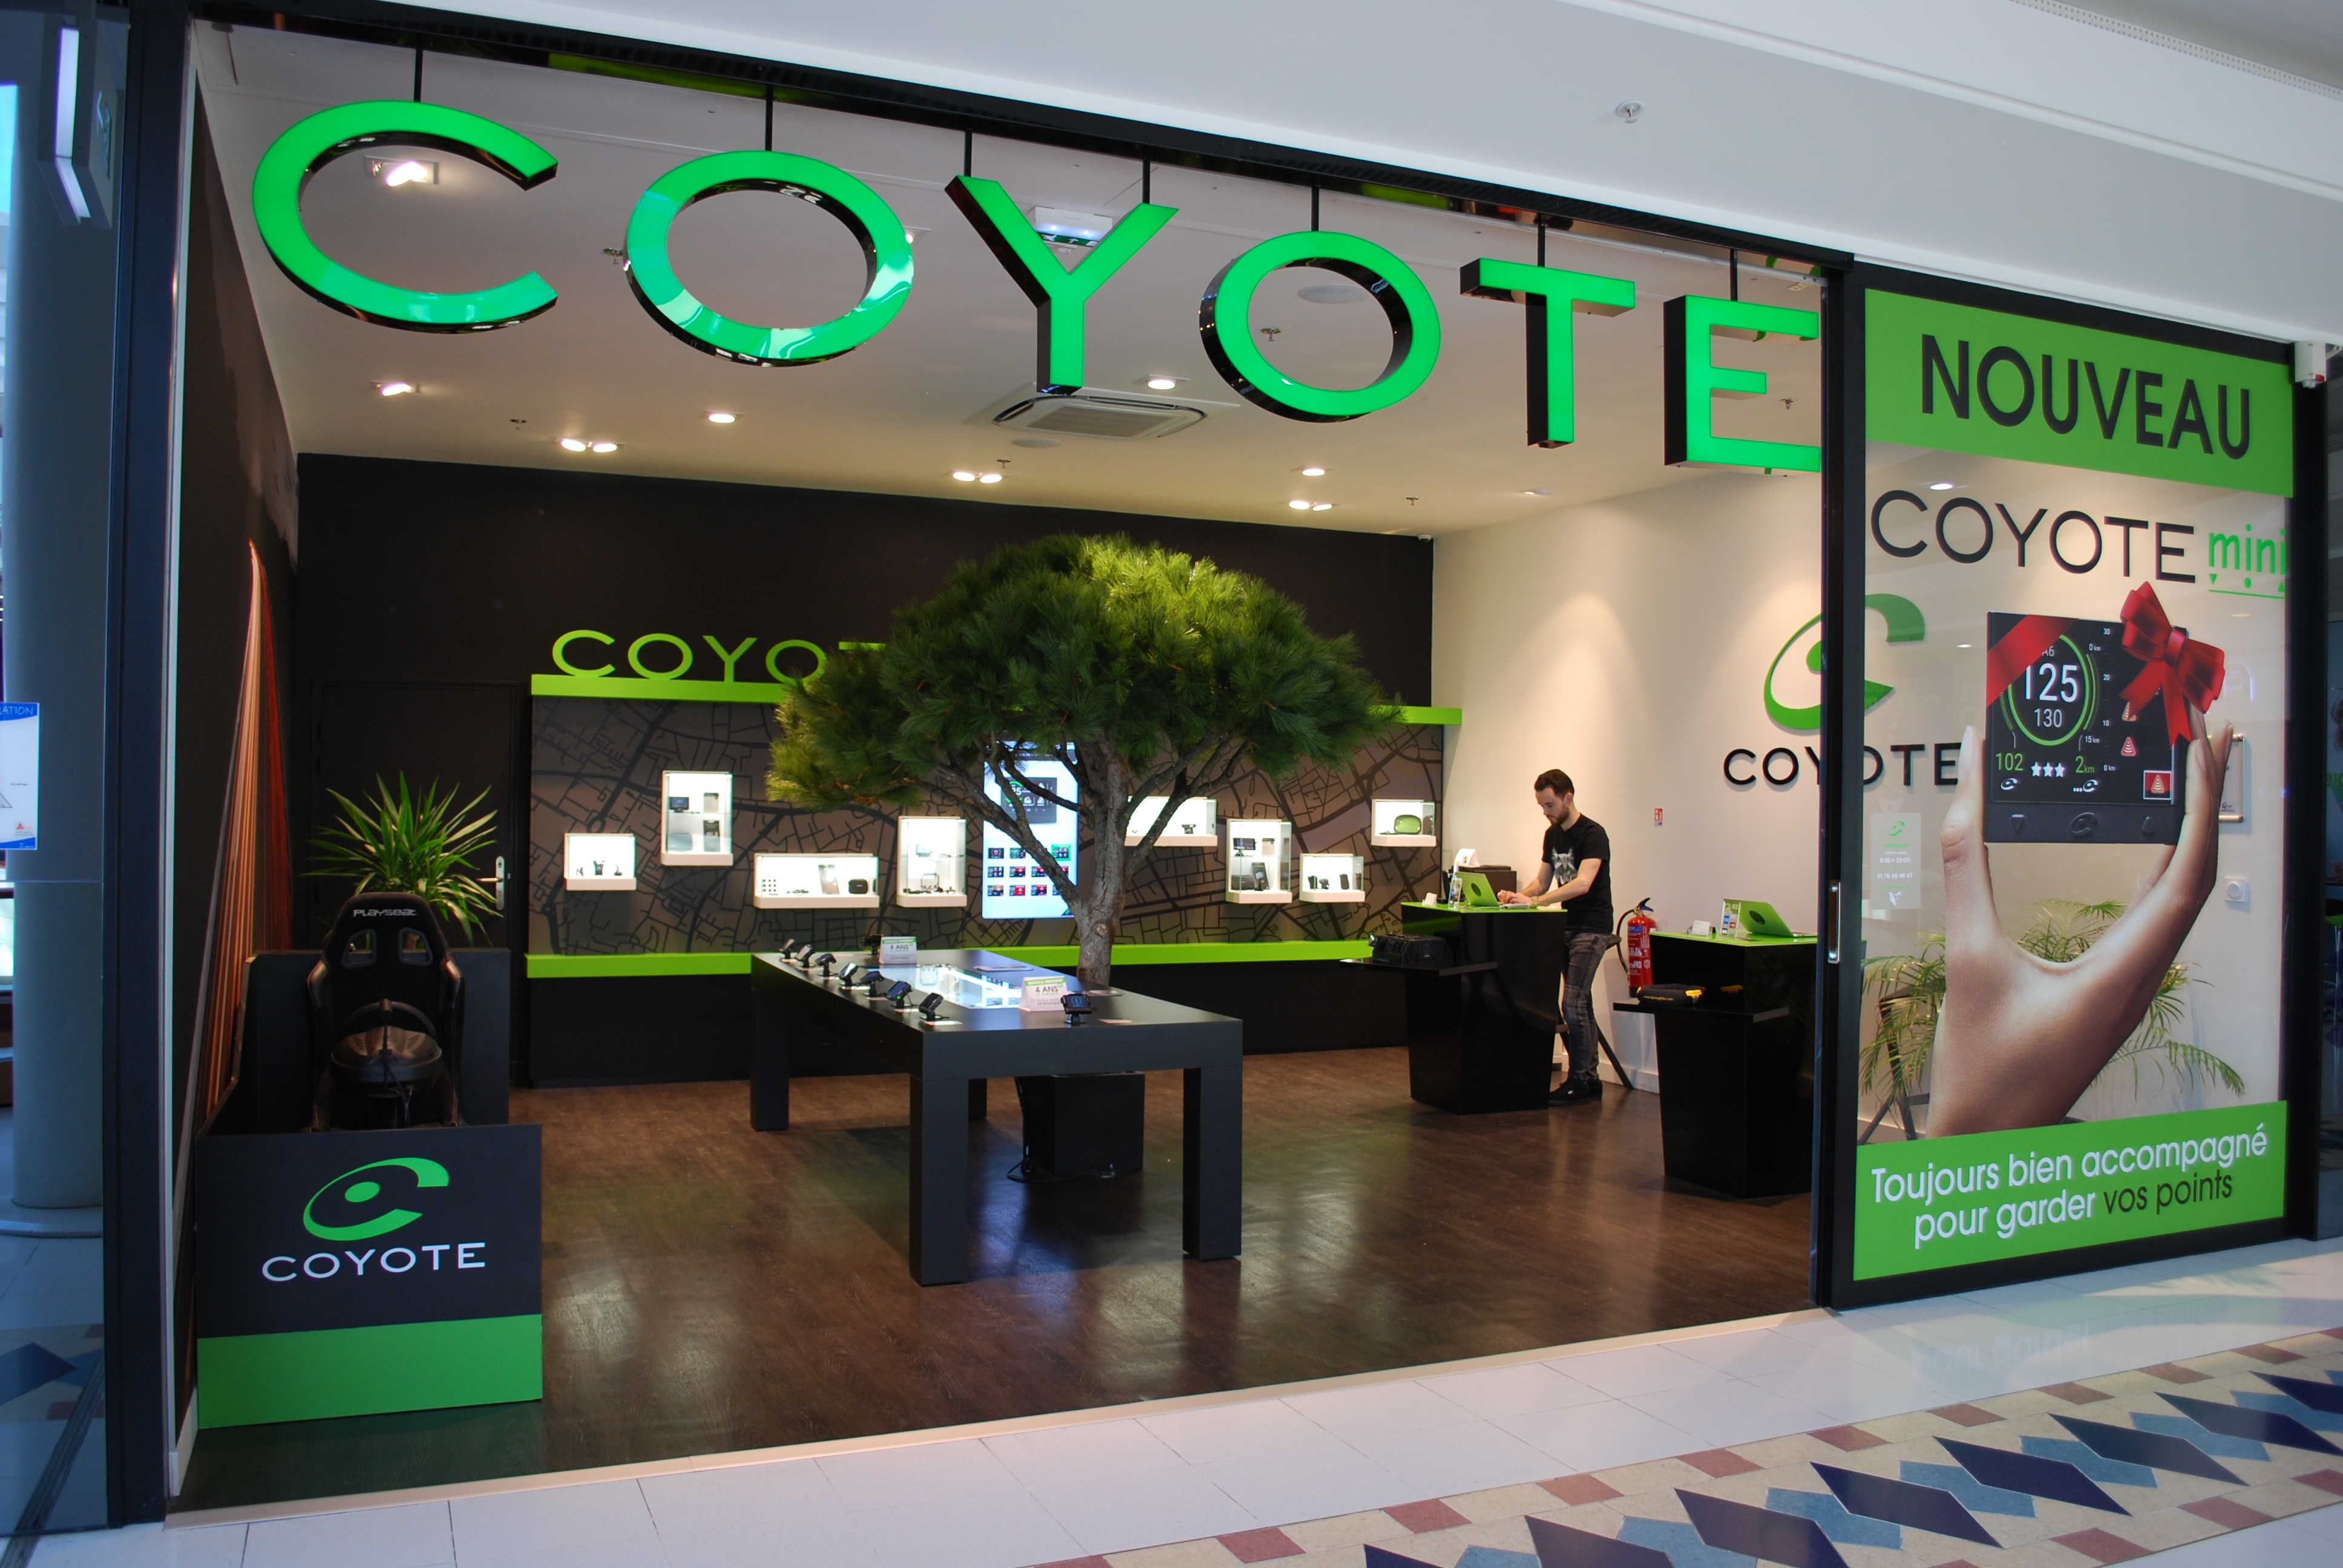 magasin coyote nantes tout l quipement du bo tier gps. Black Bedroom Furniture Sets. Home Design Ideas